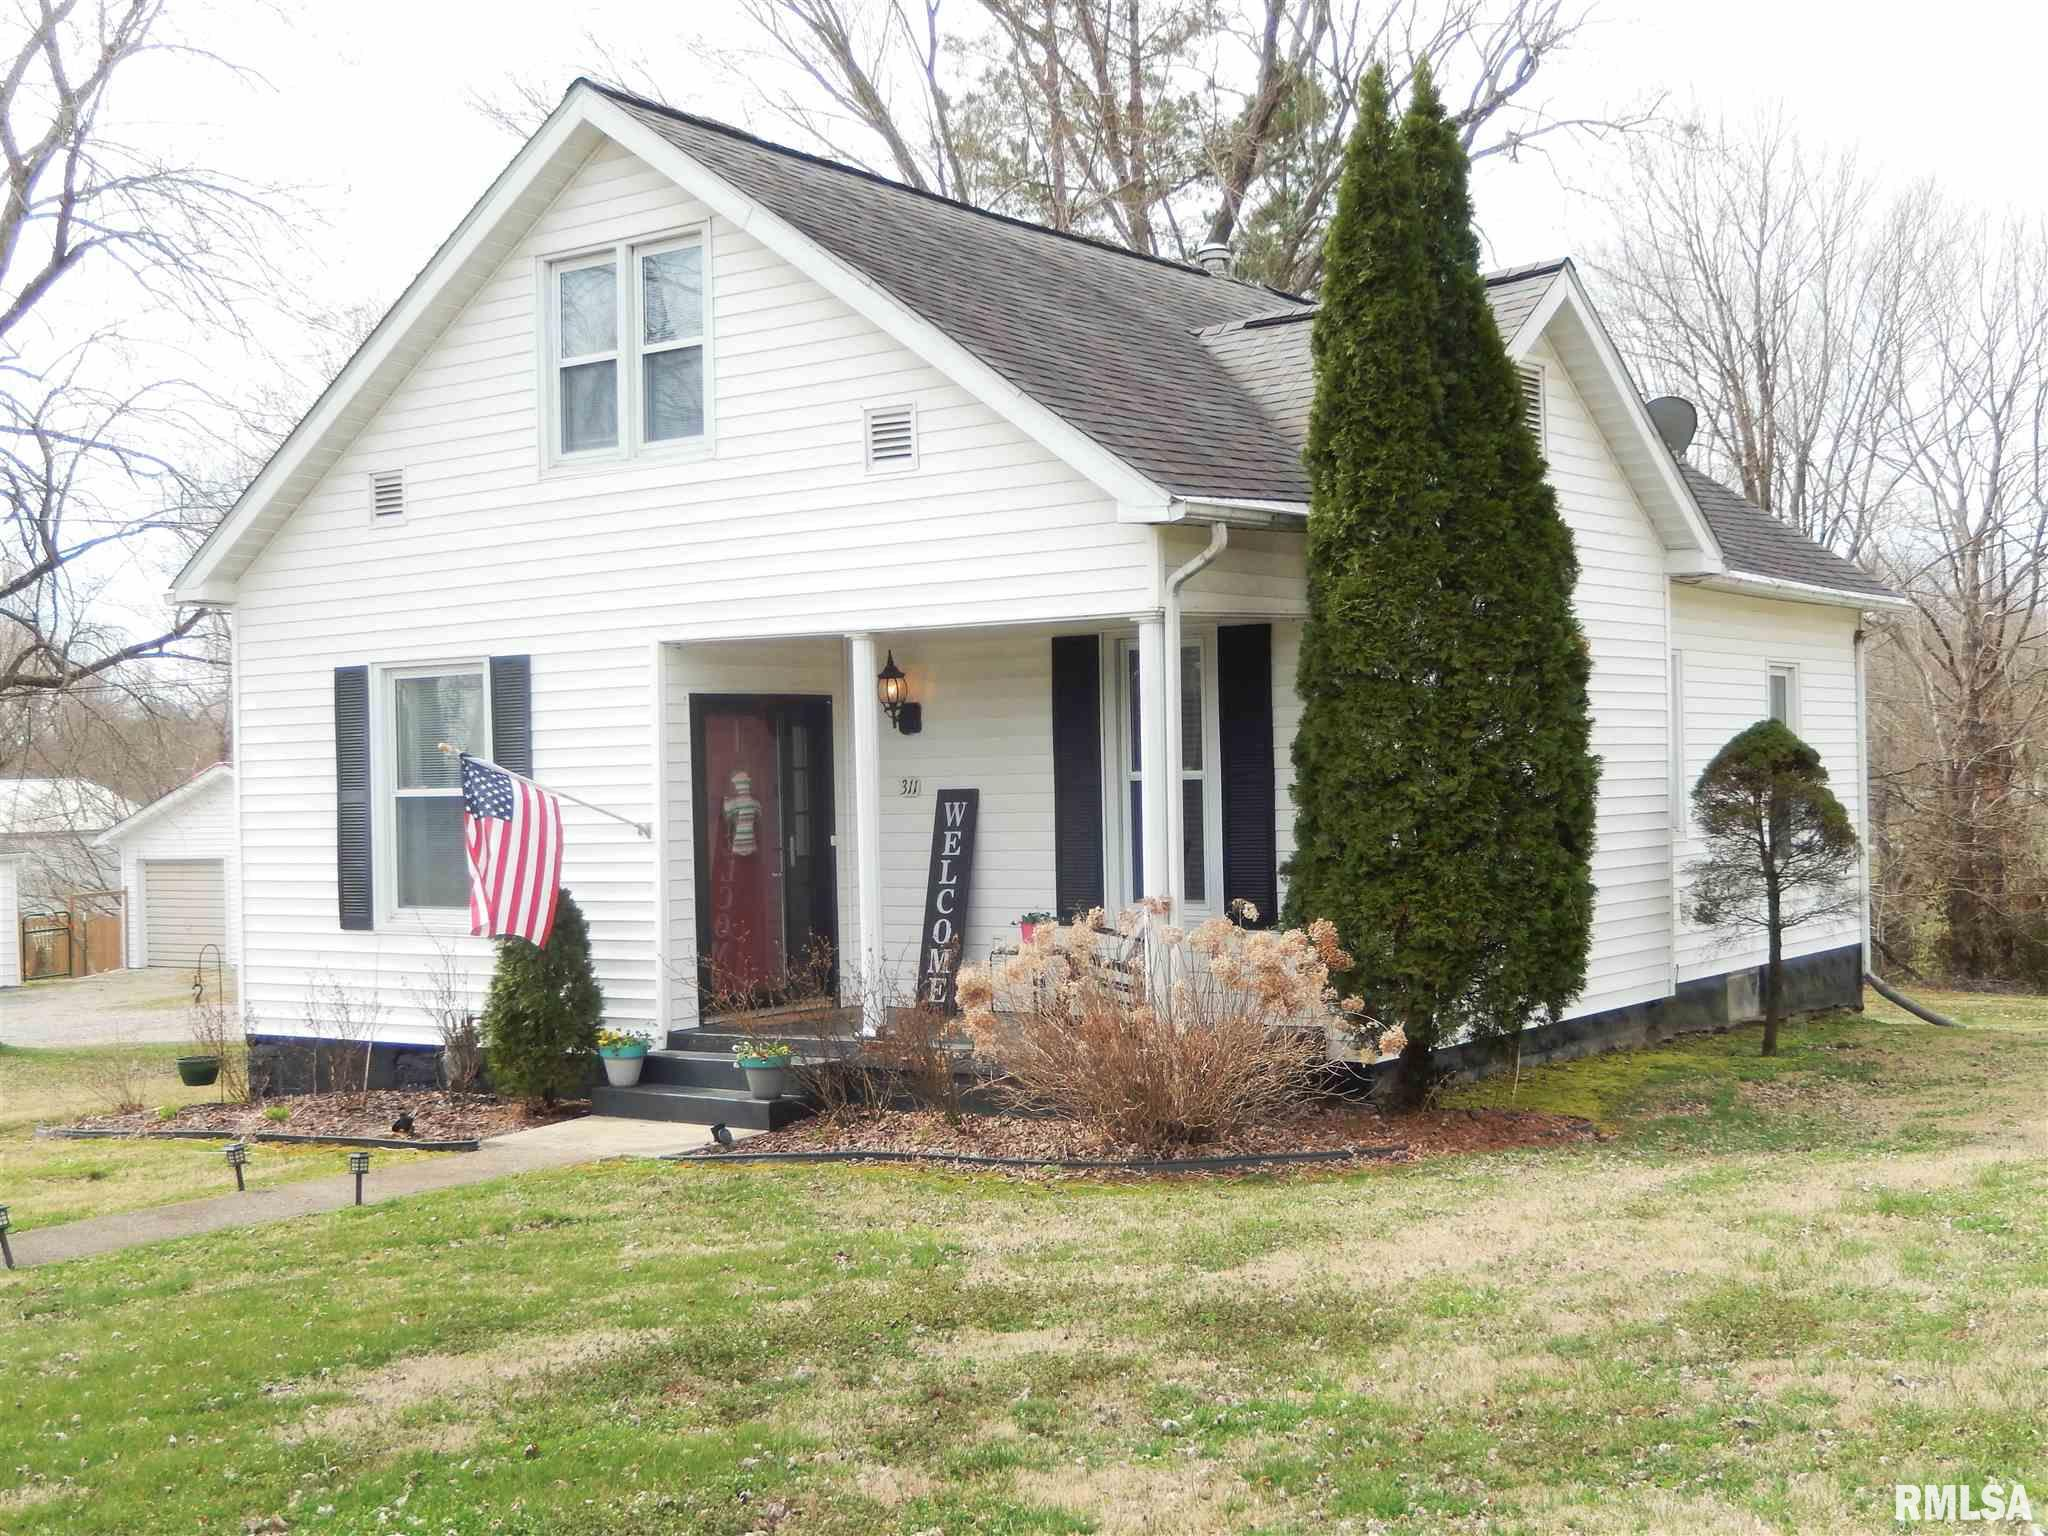 311 S LOCUST Property Photo - Jonesboro, IL real estate listing